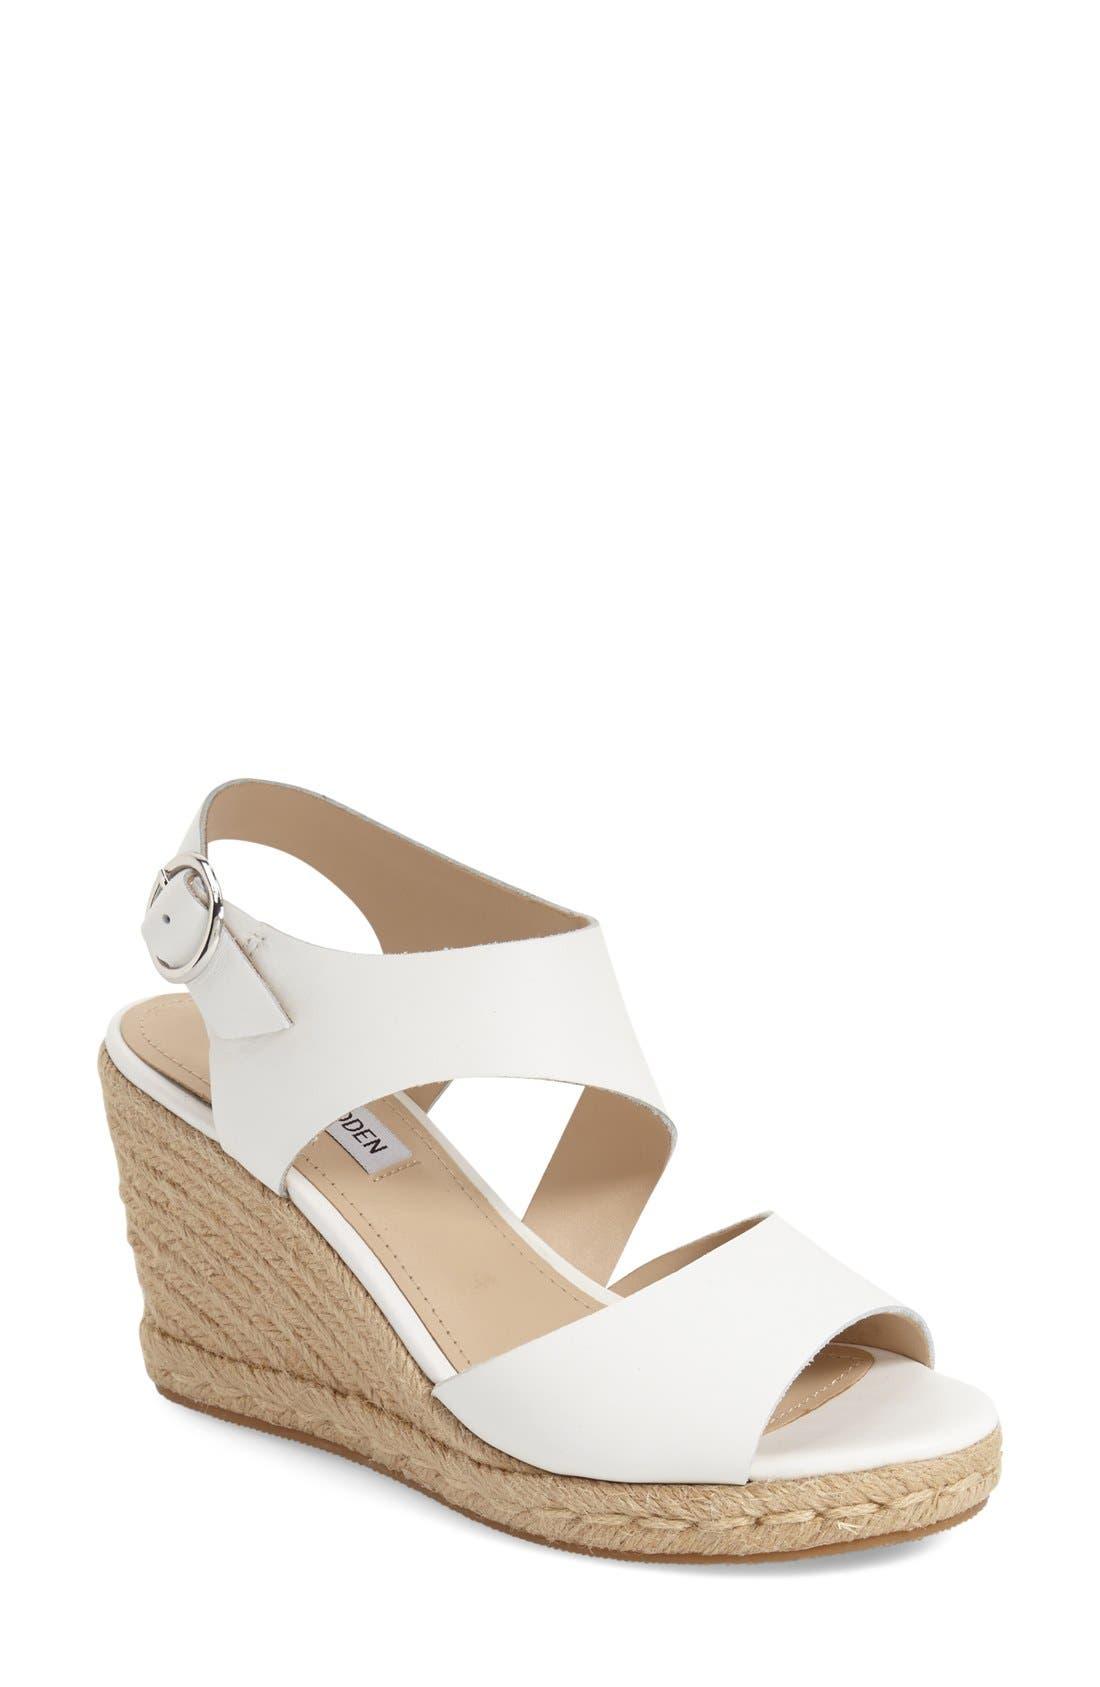 'Wavi' Espadrille Wedge Sandal,                             Main thumbnail 1, color,                             White Leather